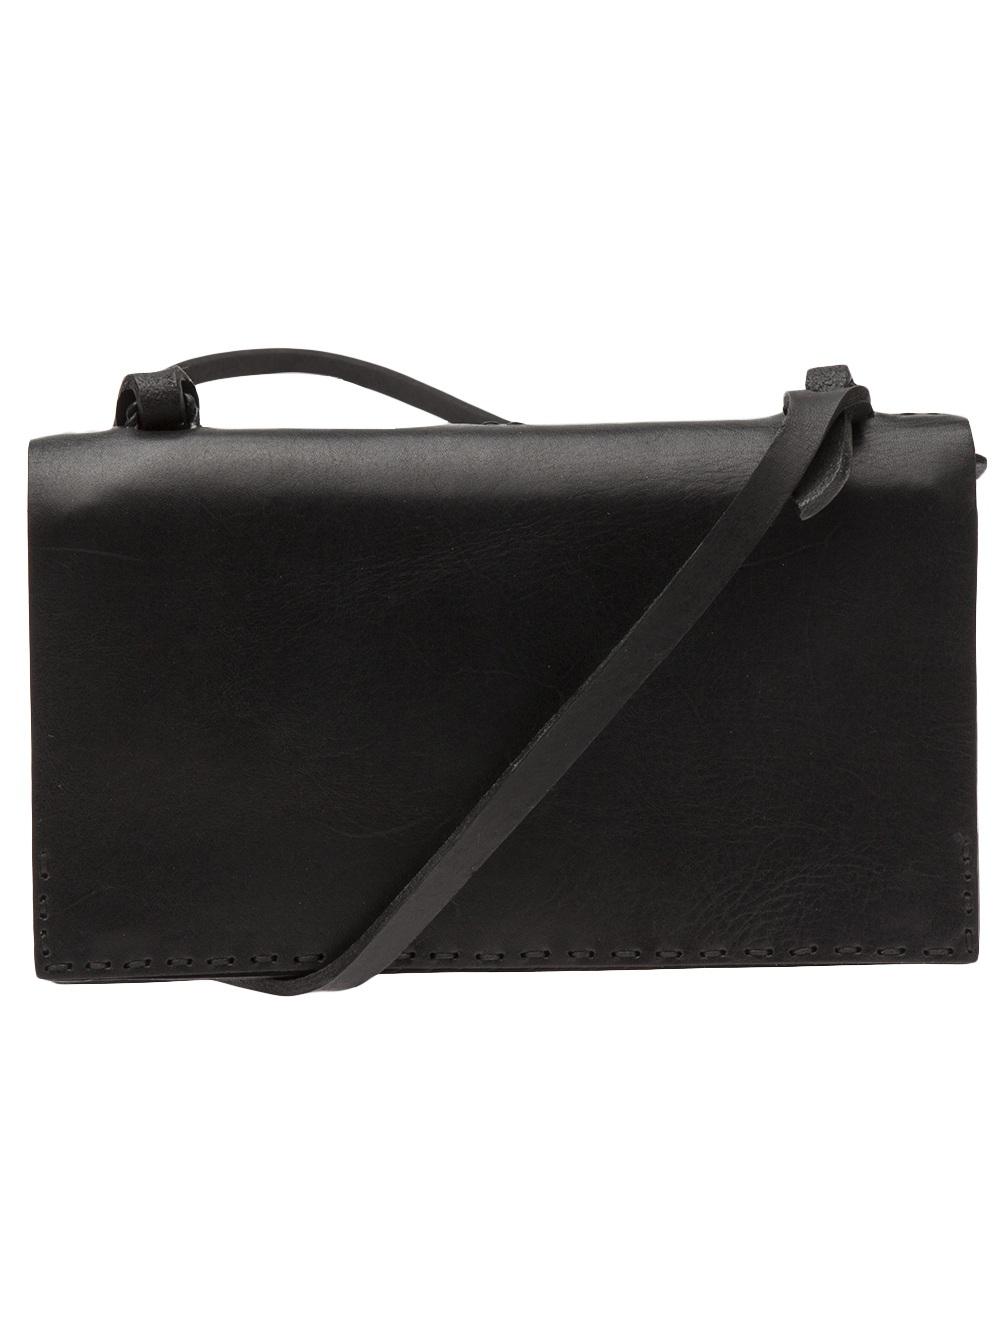 Lyst Johnny Farah Wallet Leather Cross Body Bag In Black